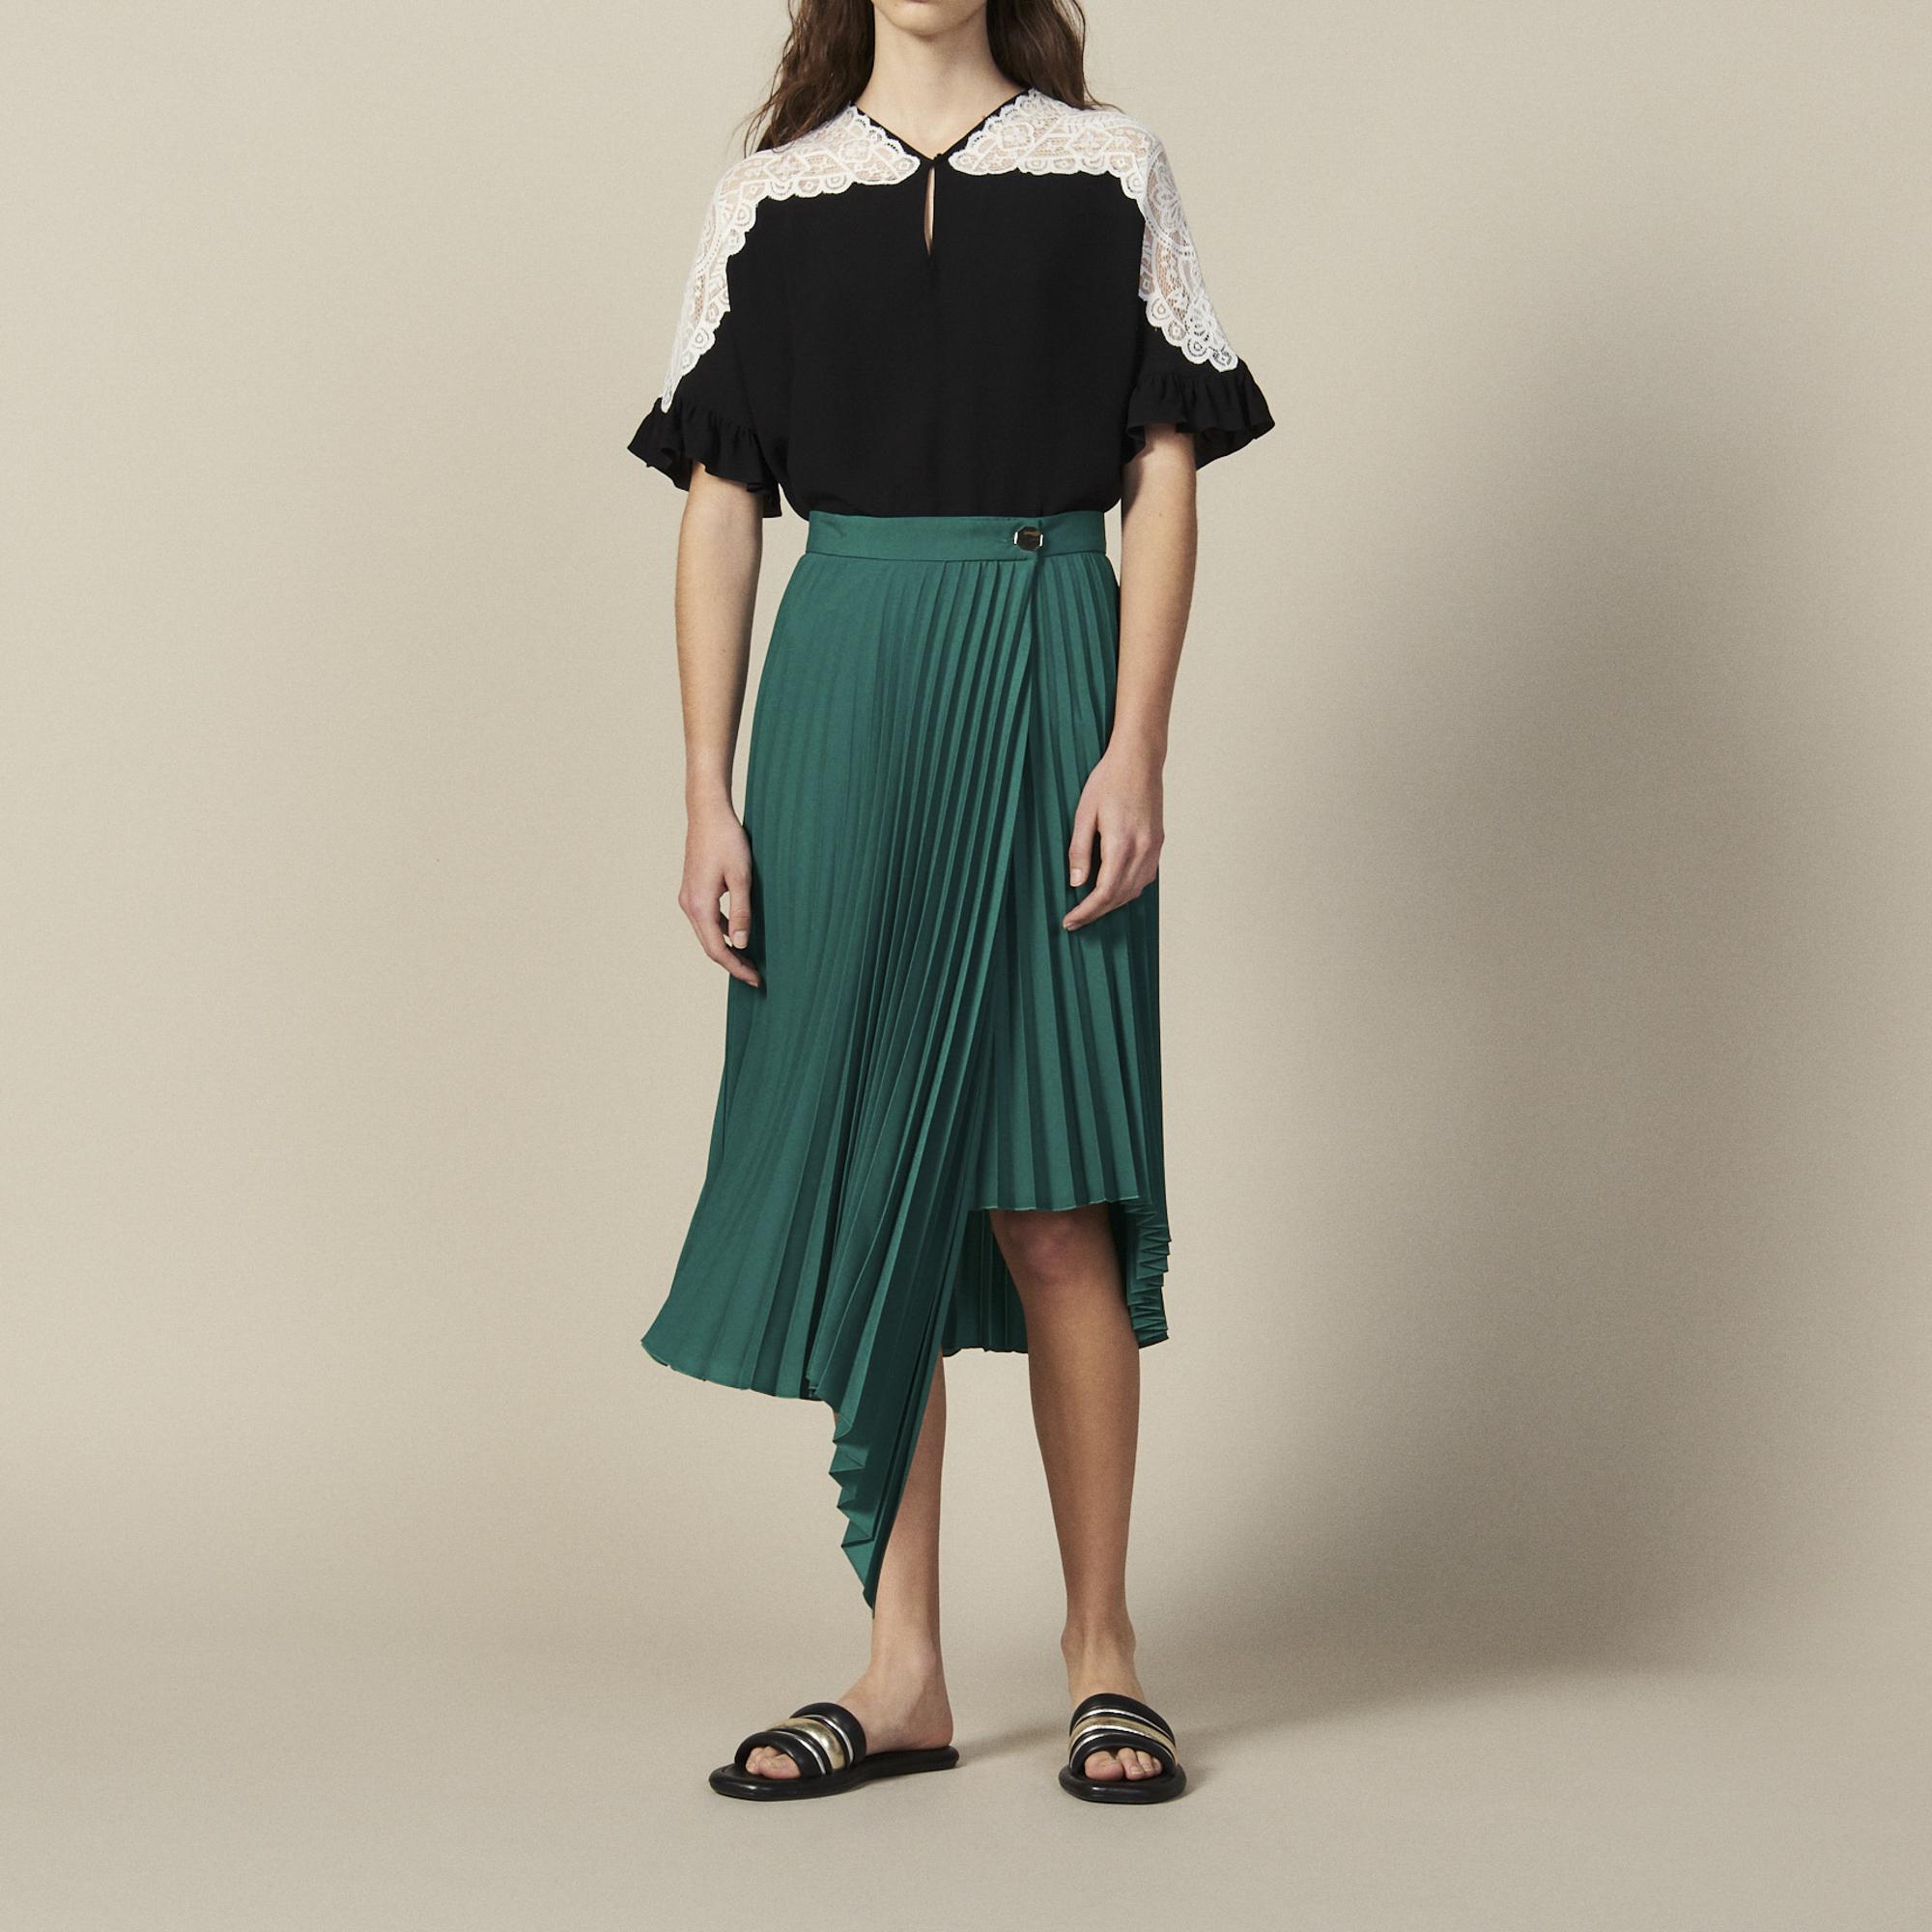 d89878506f Wraparound Pleated Asymmetric Skirt : Skirts color Green ...